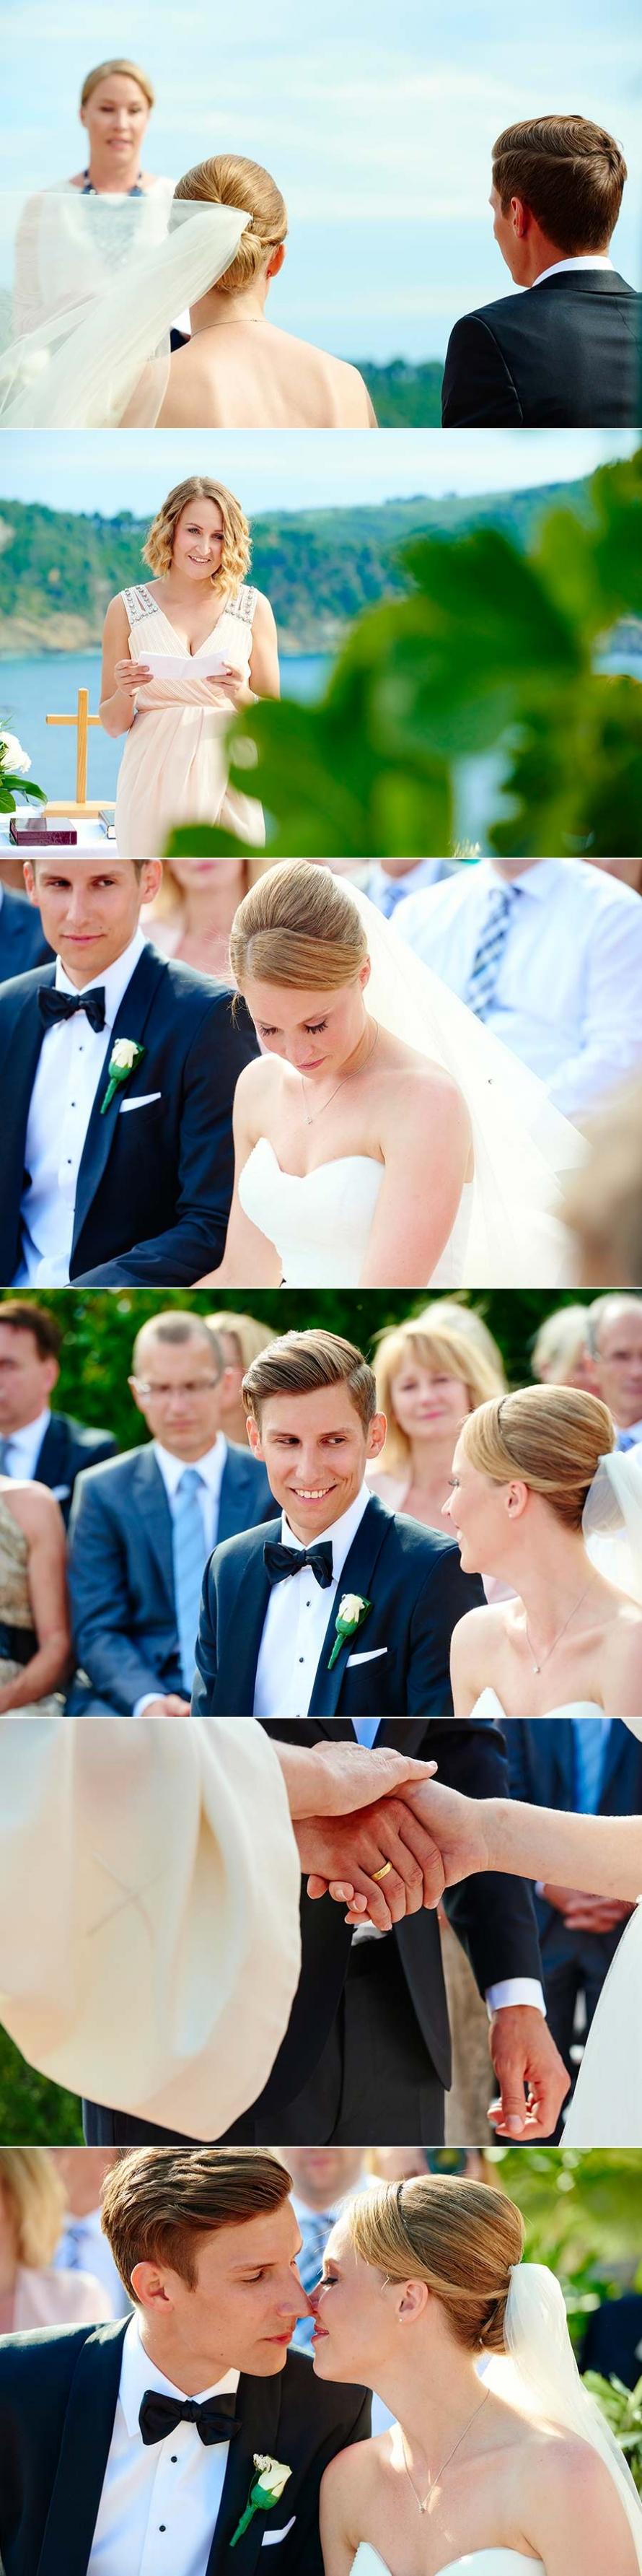 Tobi & Vanessa wedding photos 14